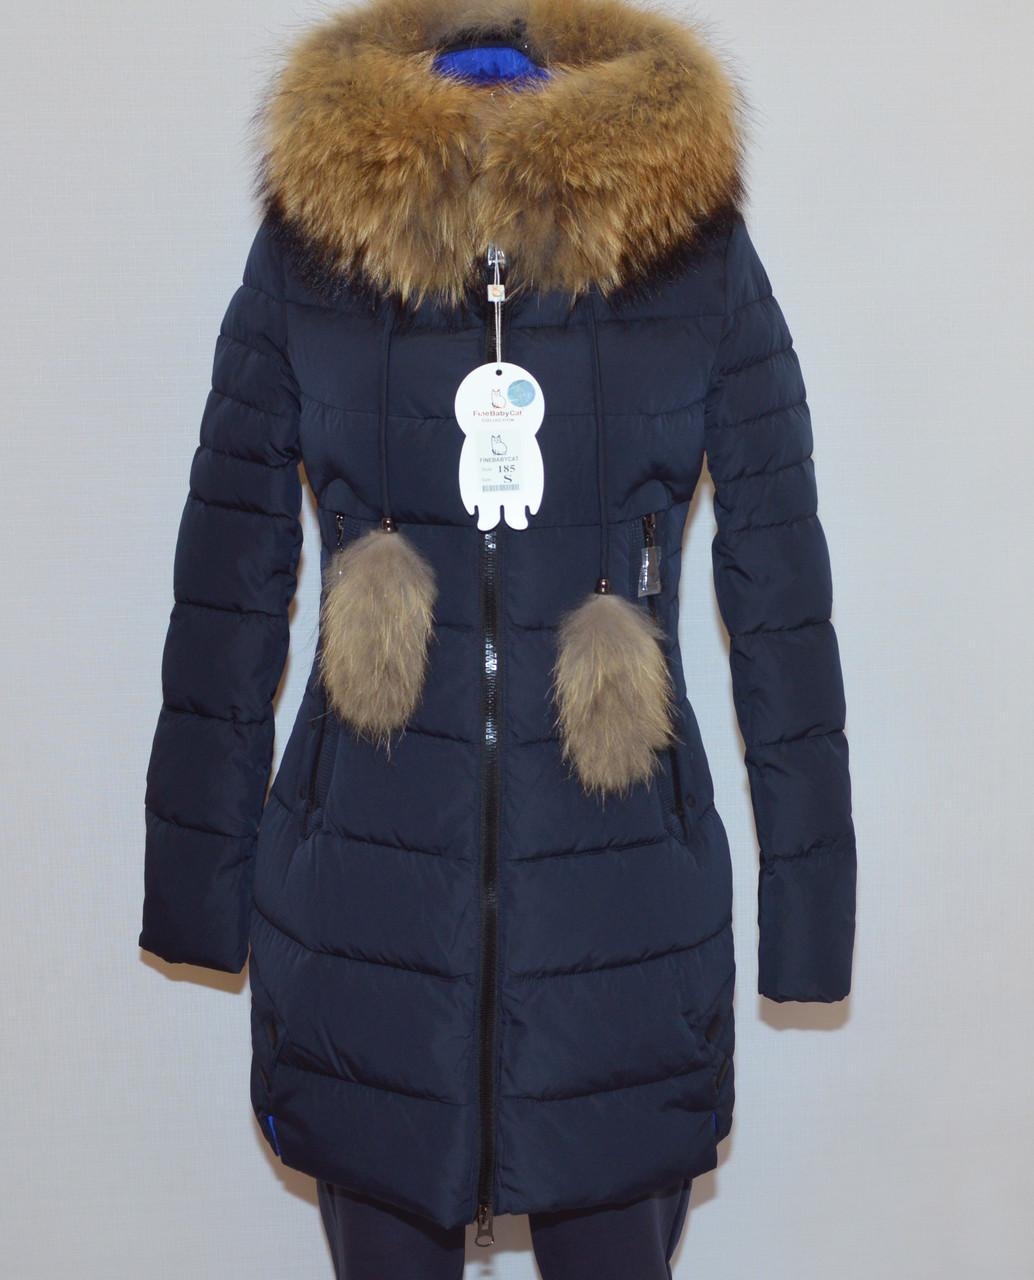 Куртка женская зимняя FINEBABYCAT185|мех енот|